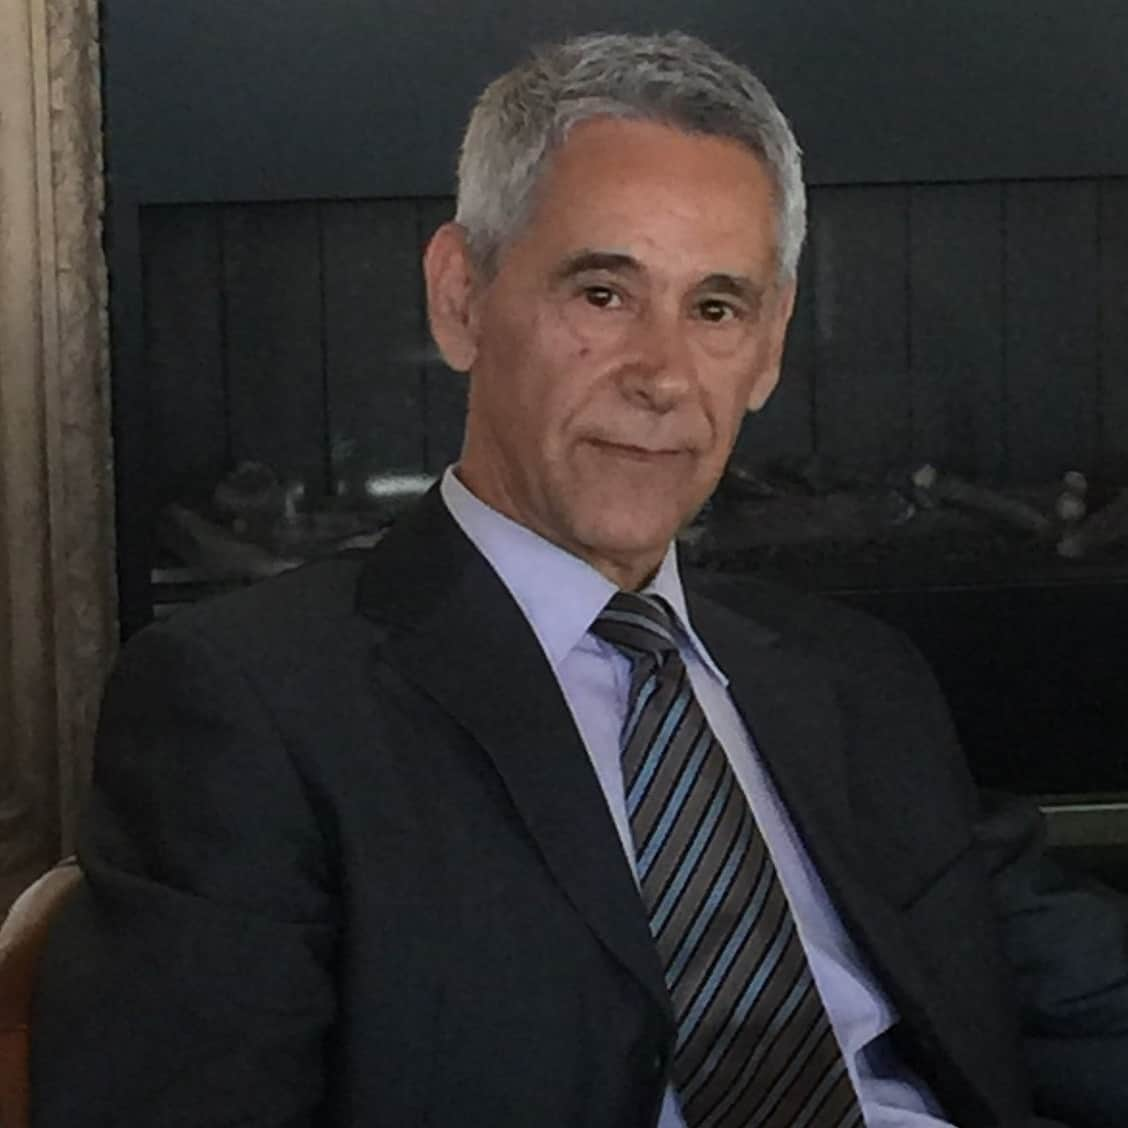 Santiago Cano